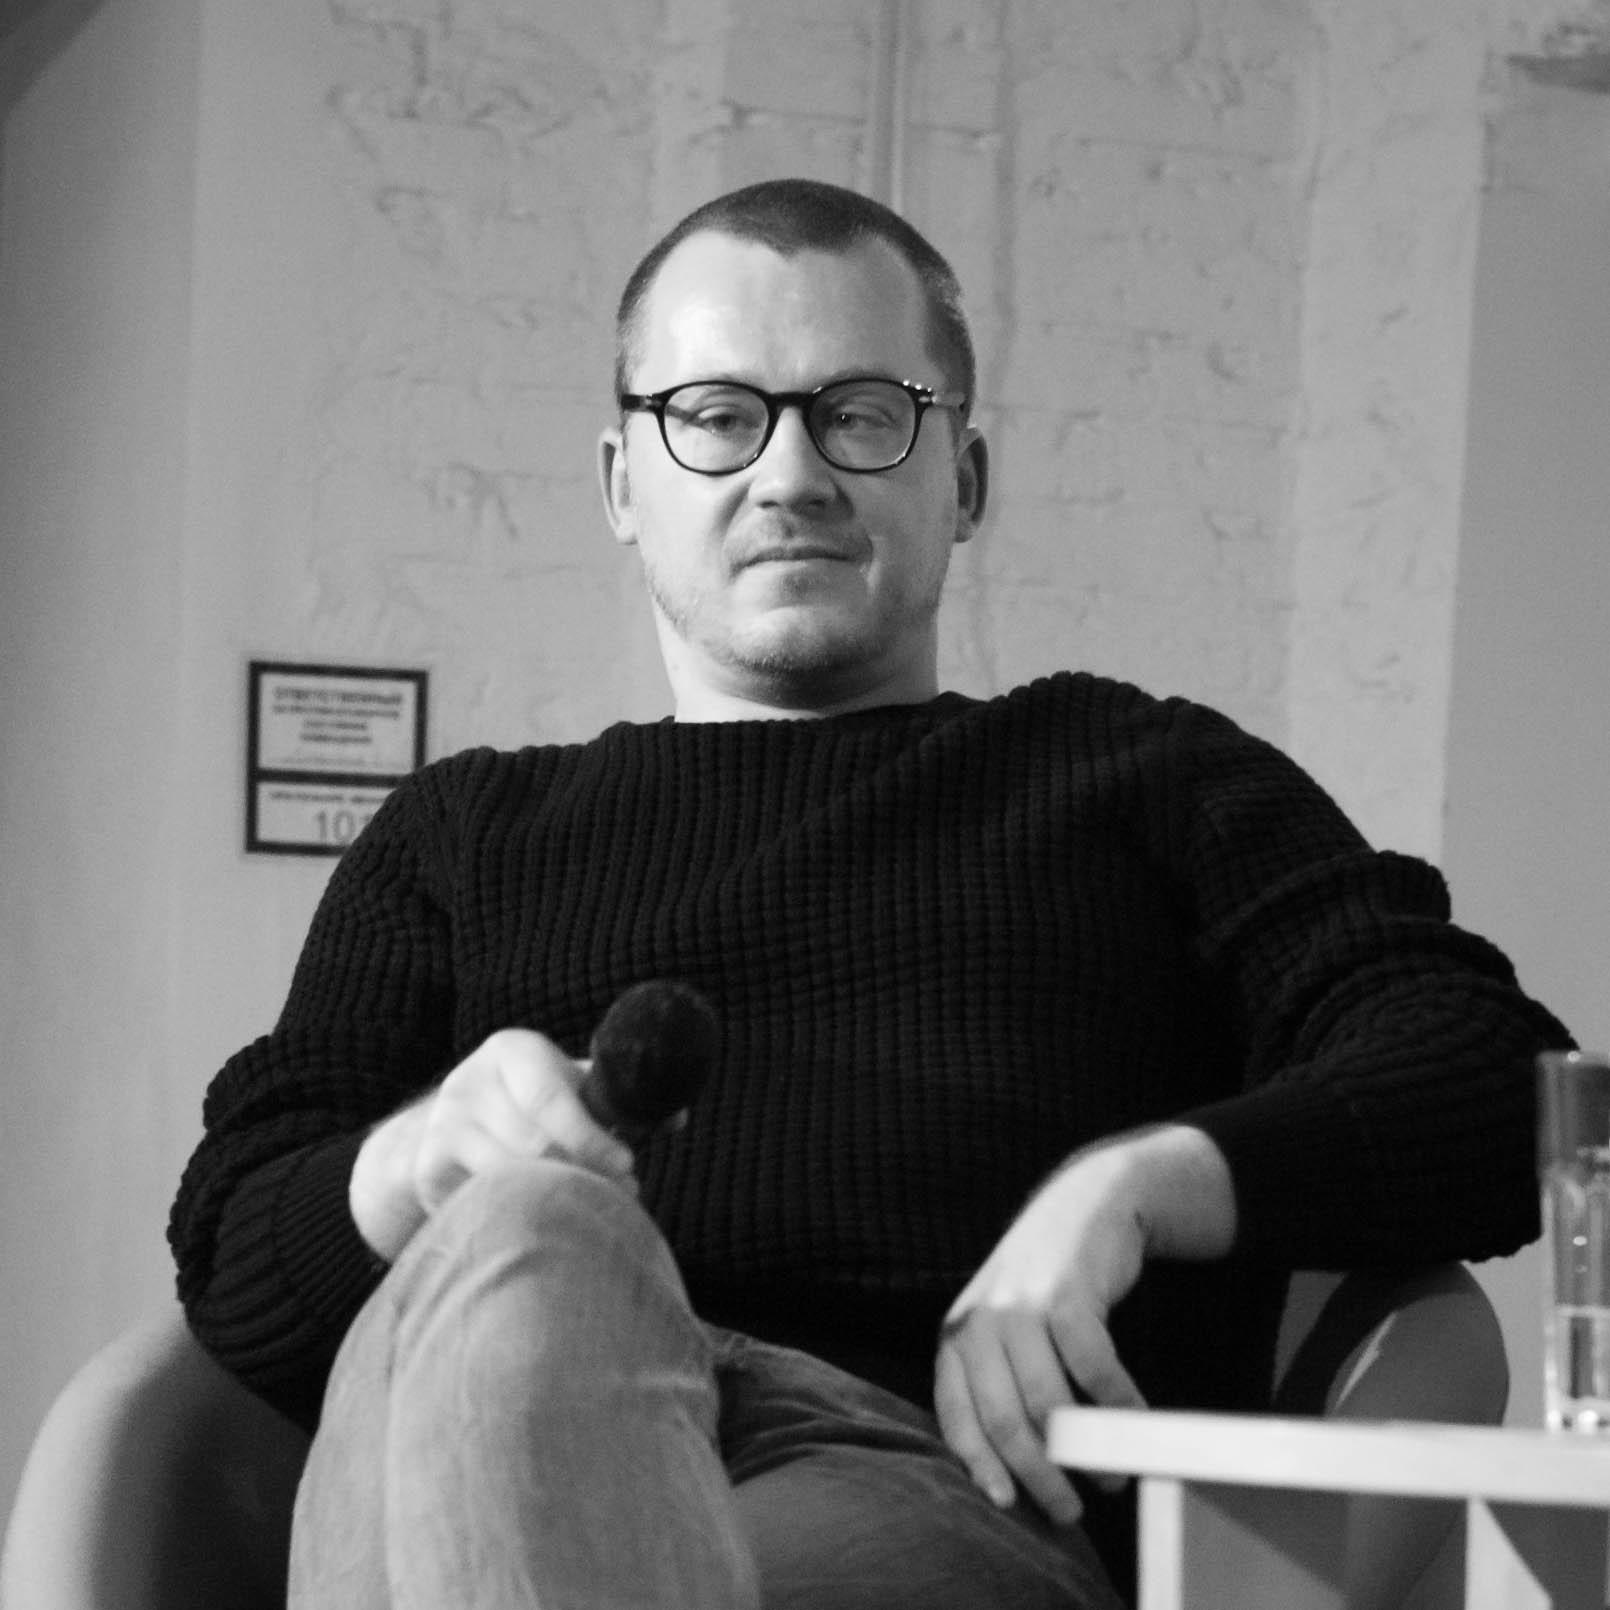 Alisa Khazanova file:public interview with roman volobuev and alisa